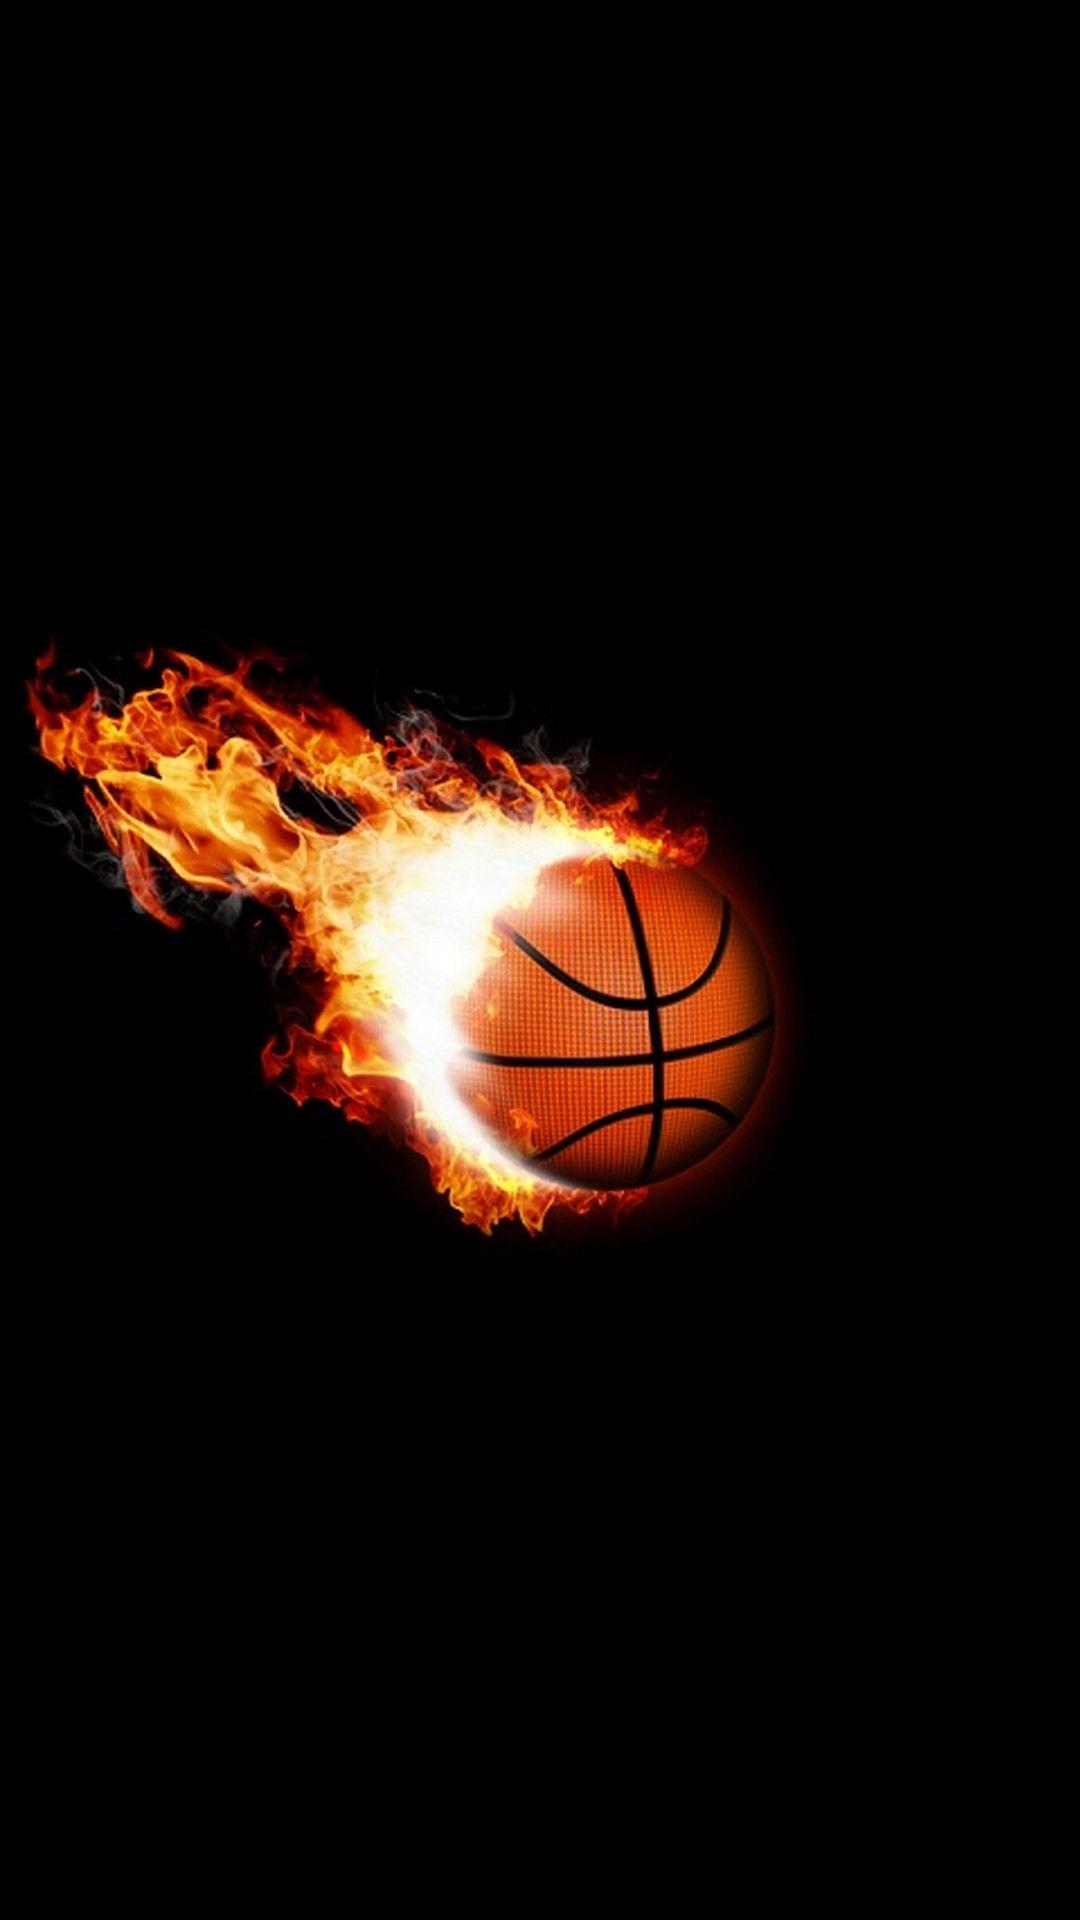 NBA Basketball HD Wallpaper For iPhone 2021 Basketball Wallpaper 1080x1920